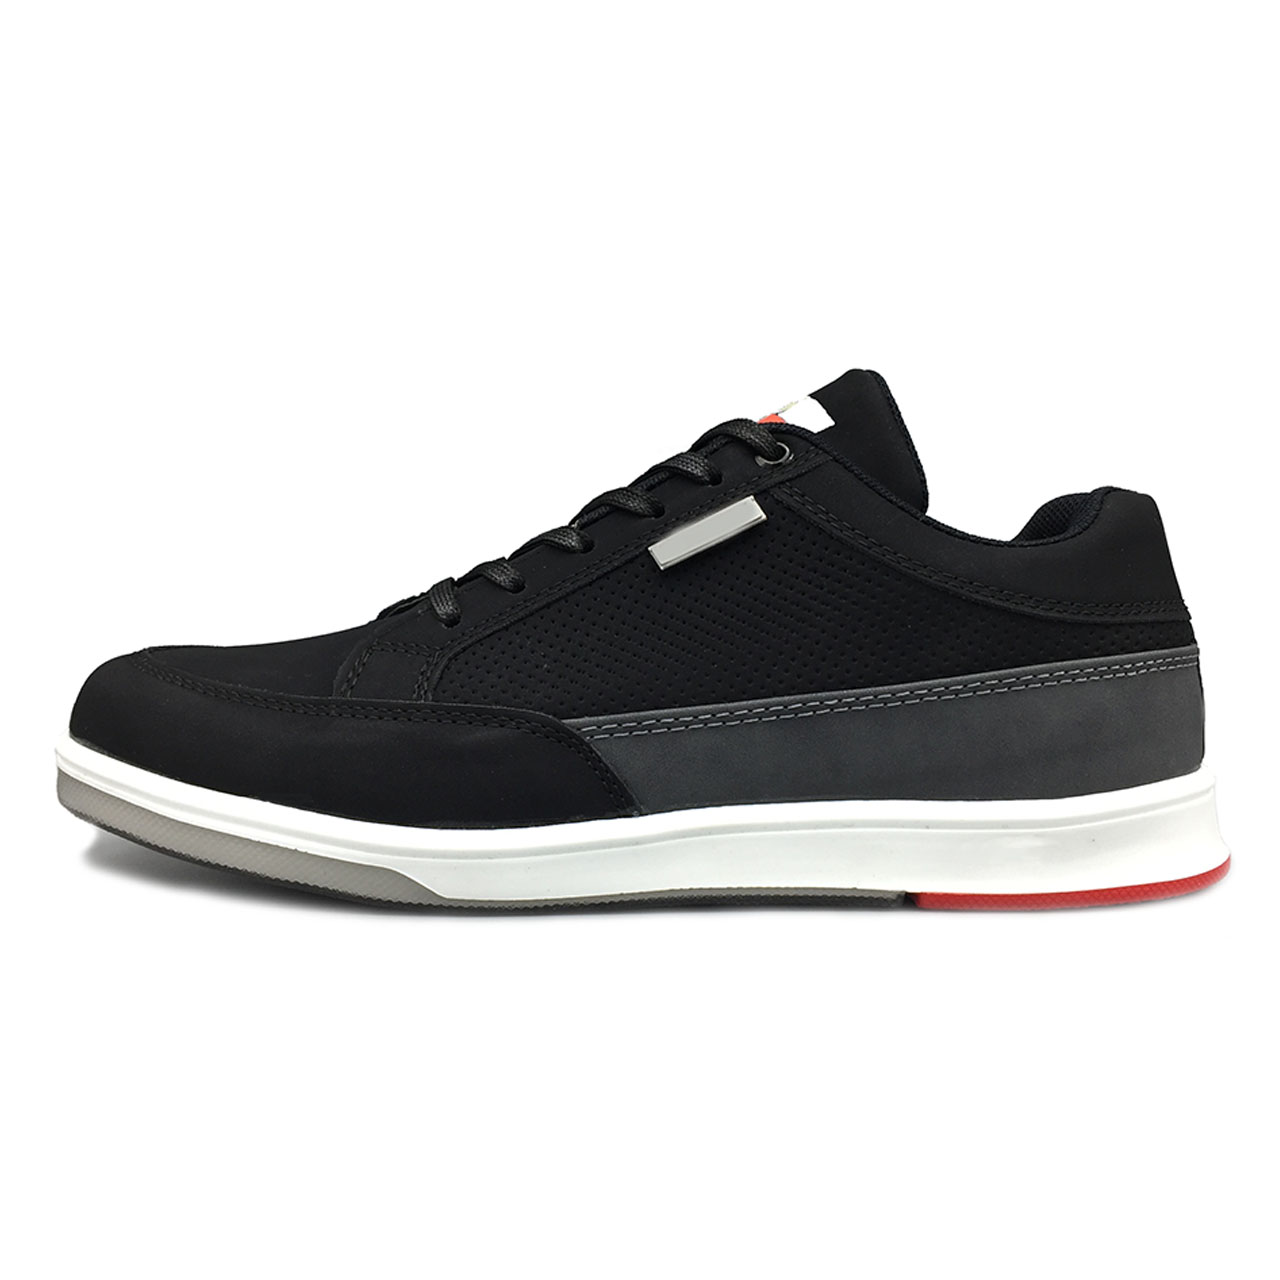 خرید                      کفش اسپورت مردانه مدل PART-ME